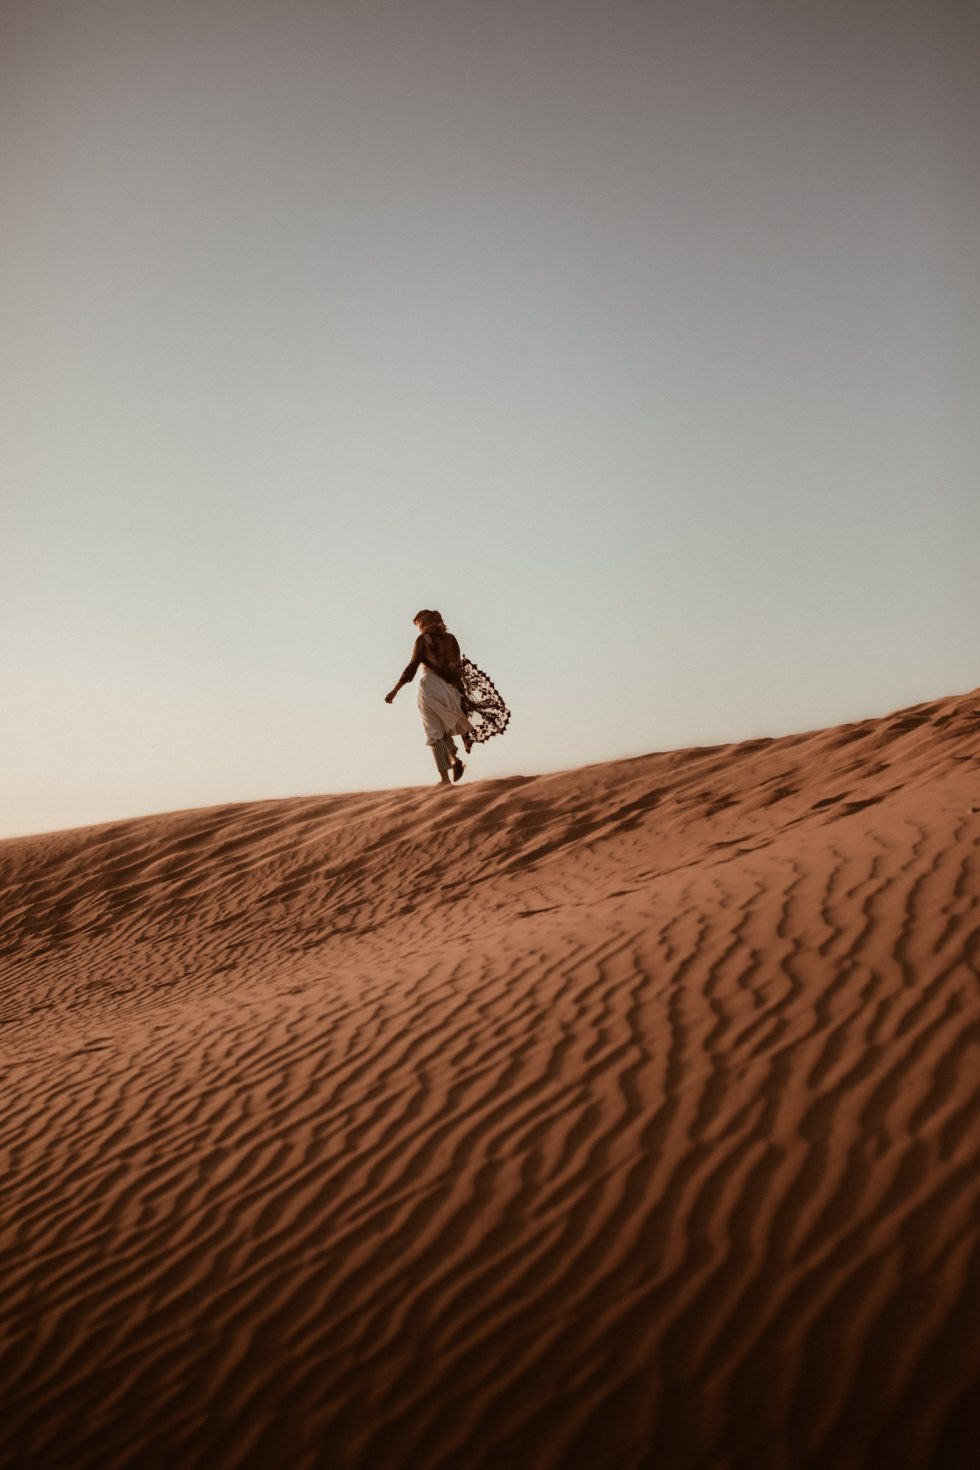 desert-morocco-travel-lifestyle-photographer-laura-g-diaz-2